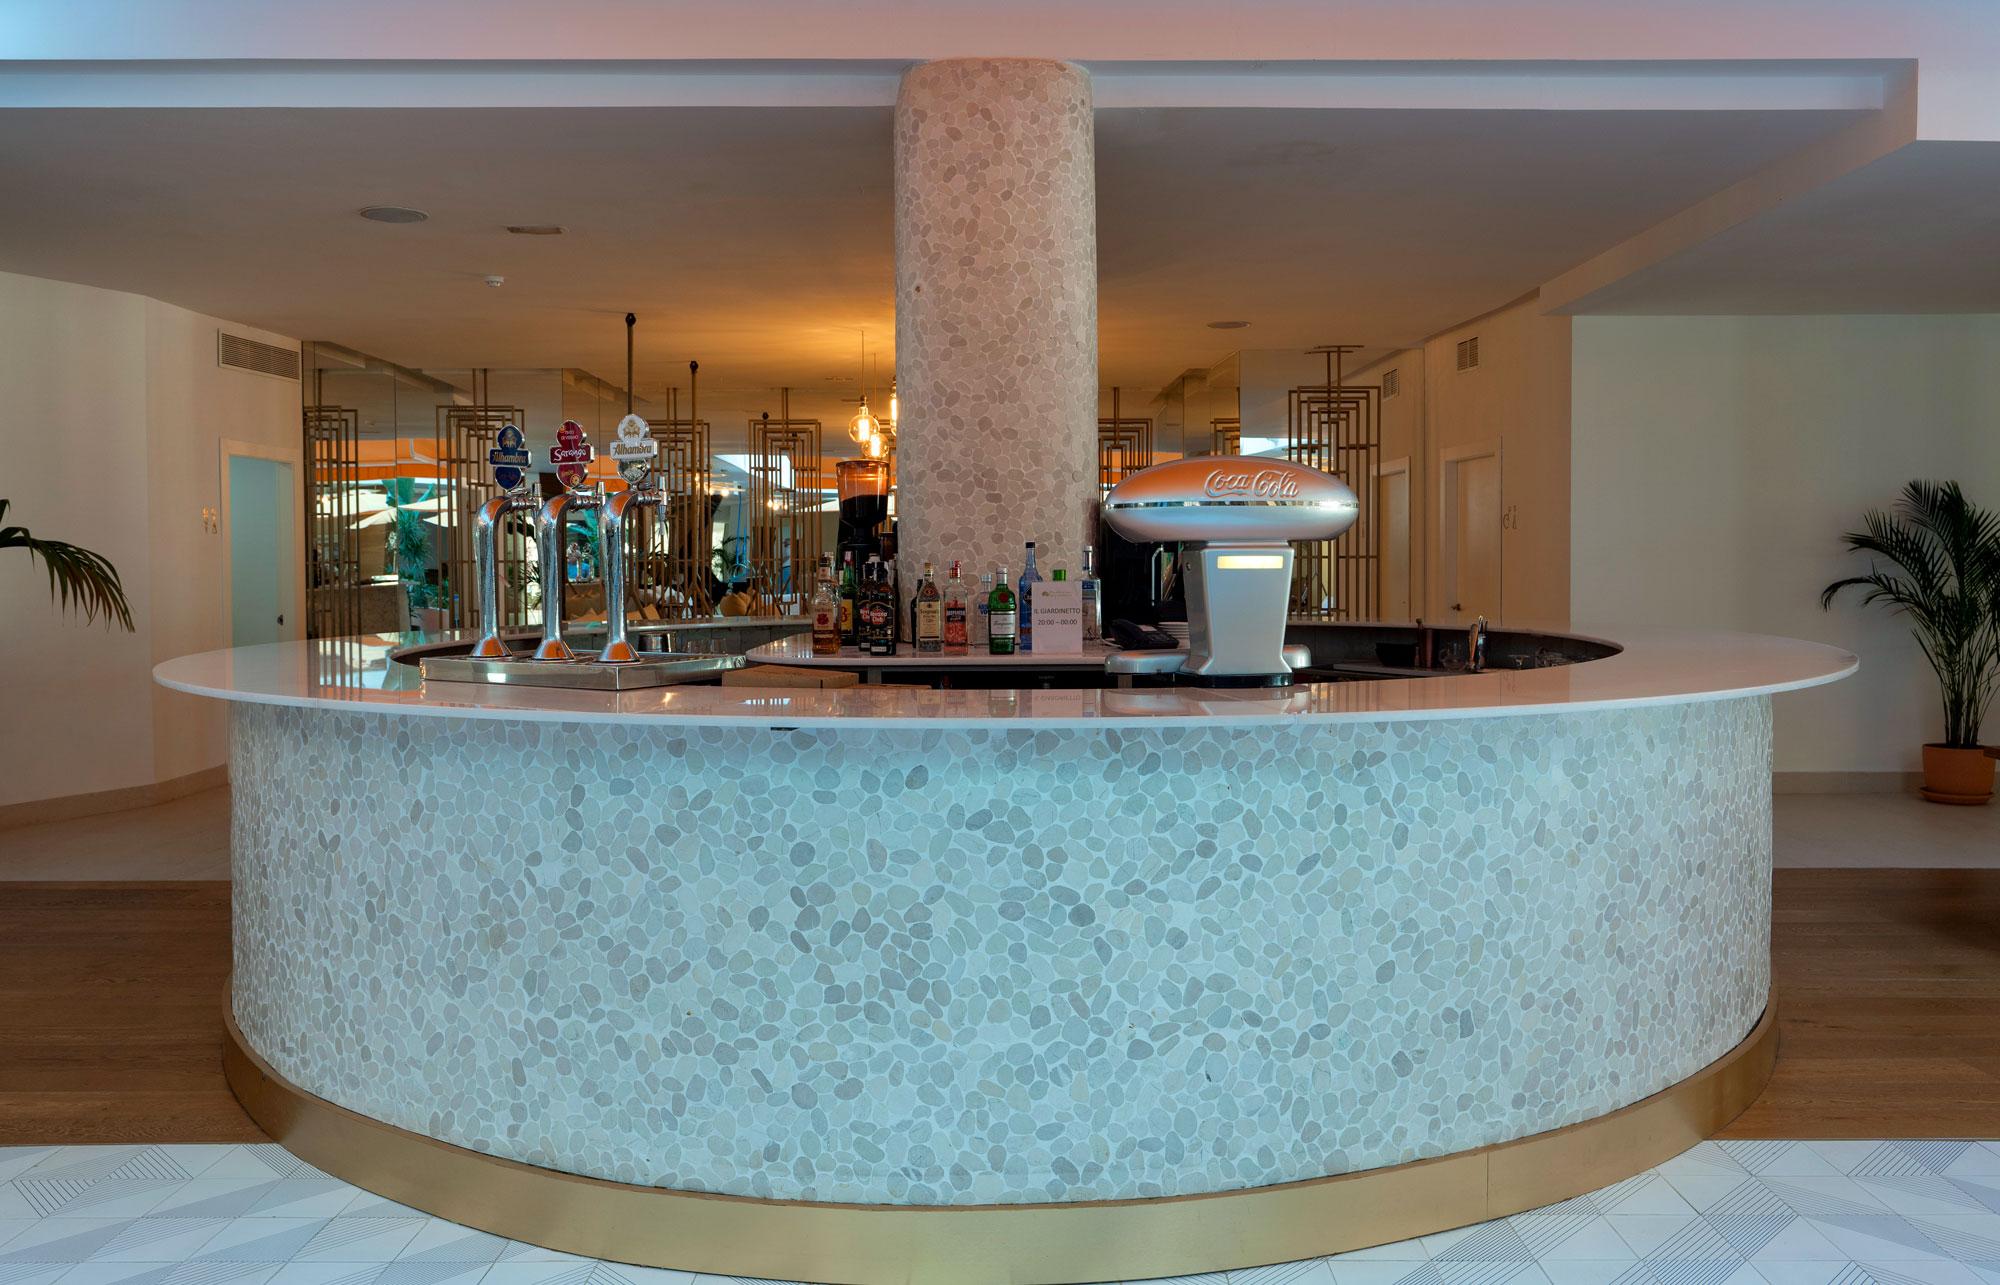 Hotel Mediterráneo  - Hotel Mediterraneo Park 13 Dekton Silestone Piedra Natural Cosentino 192